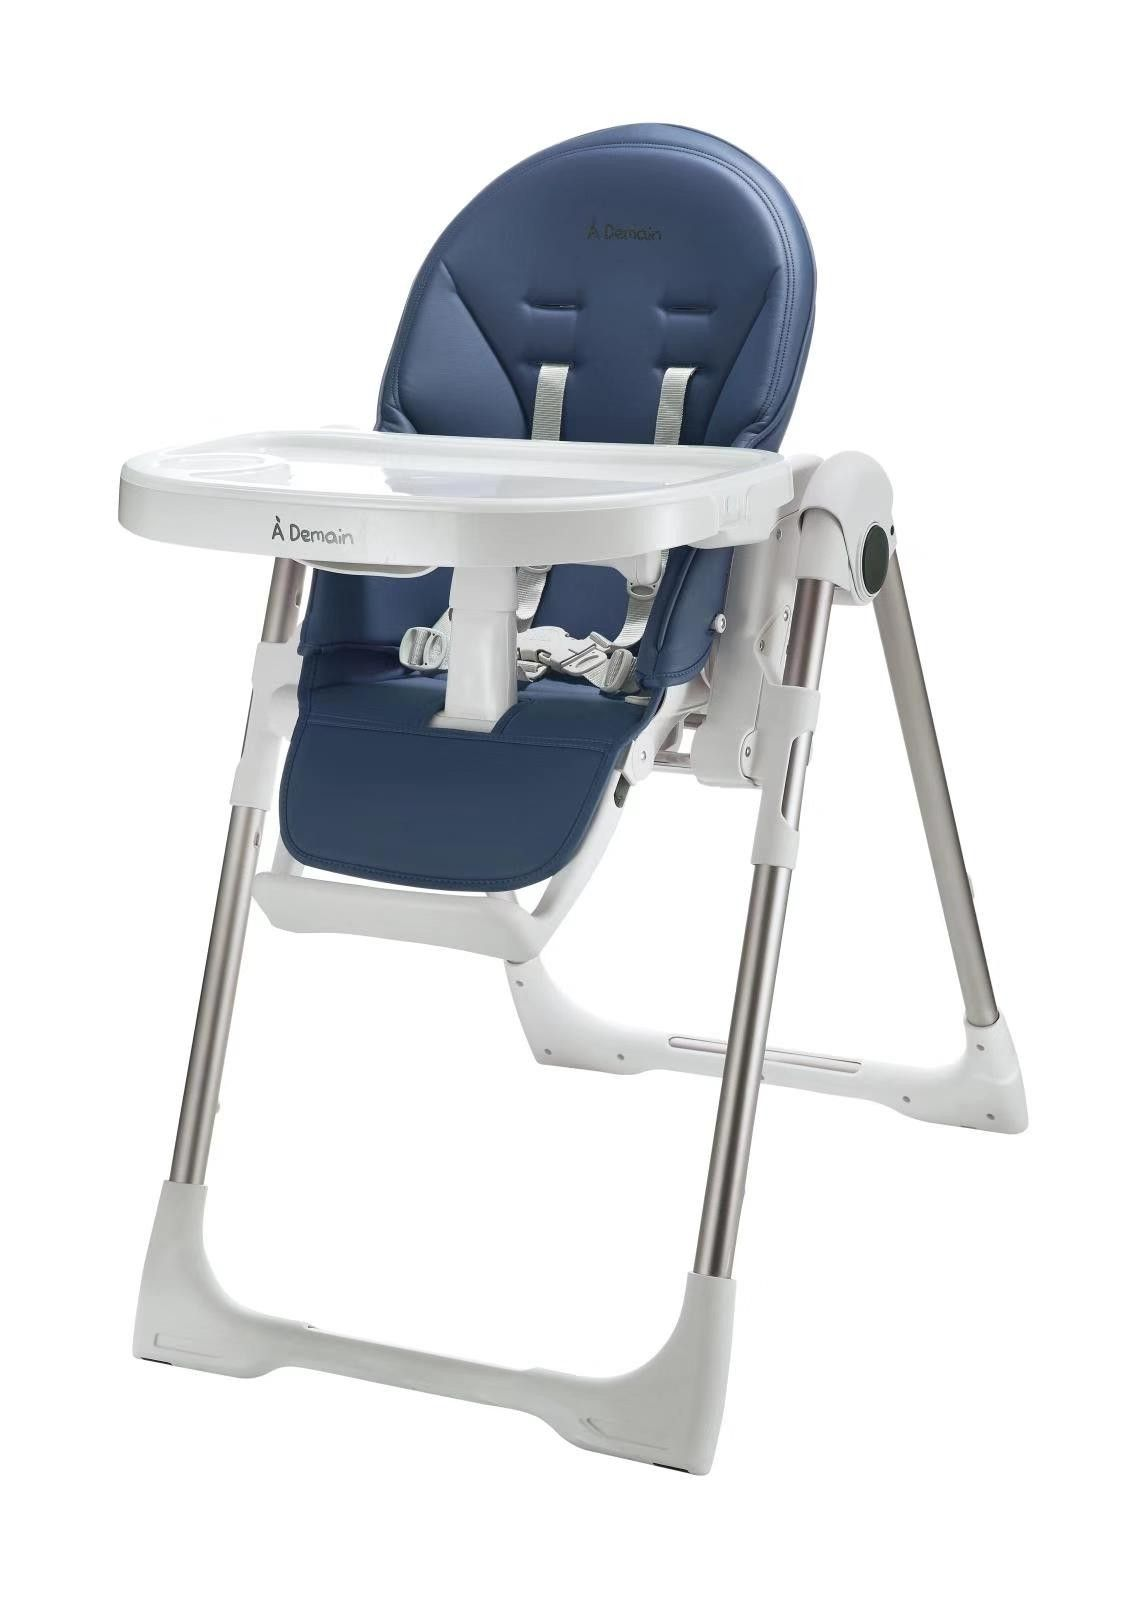 Baby Direct Ademain 3 In 1 High Chair Eta April2020 High Chair Baby High Chair Baby Chair